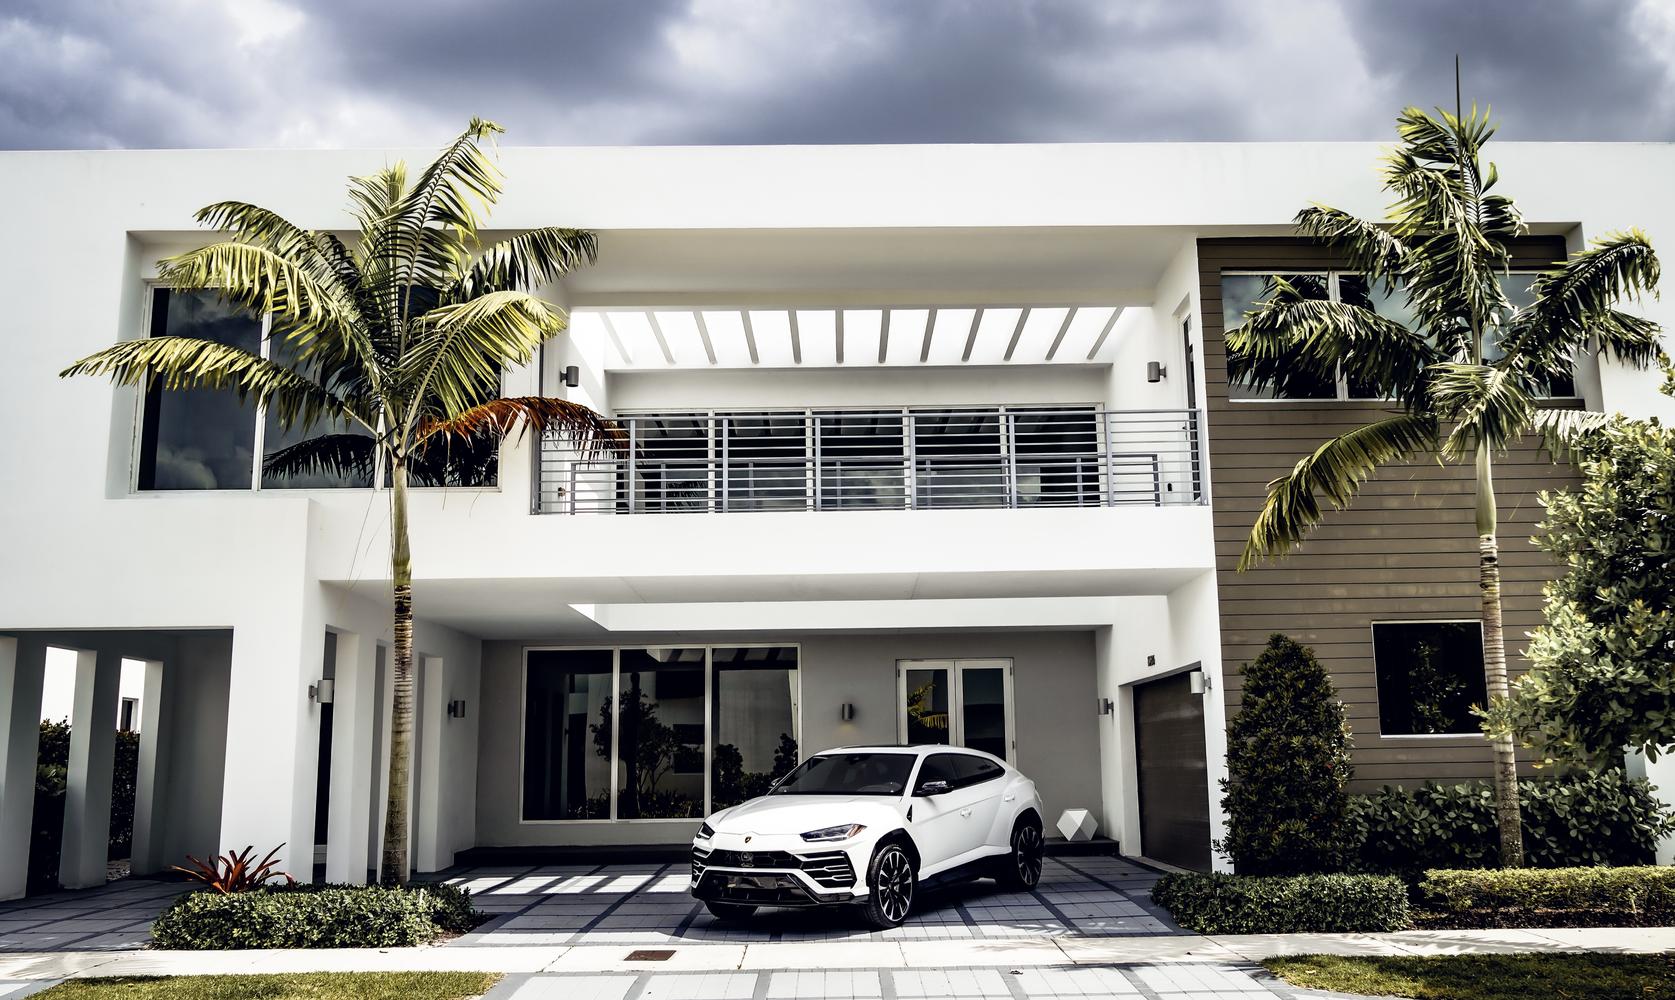 Image #15 of our  2021 LAMBORGHINI URUS - WHITE    In Miami Fort Lauderdale Palm Beach South Florida